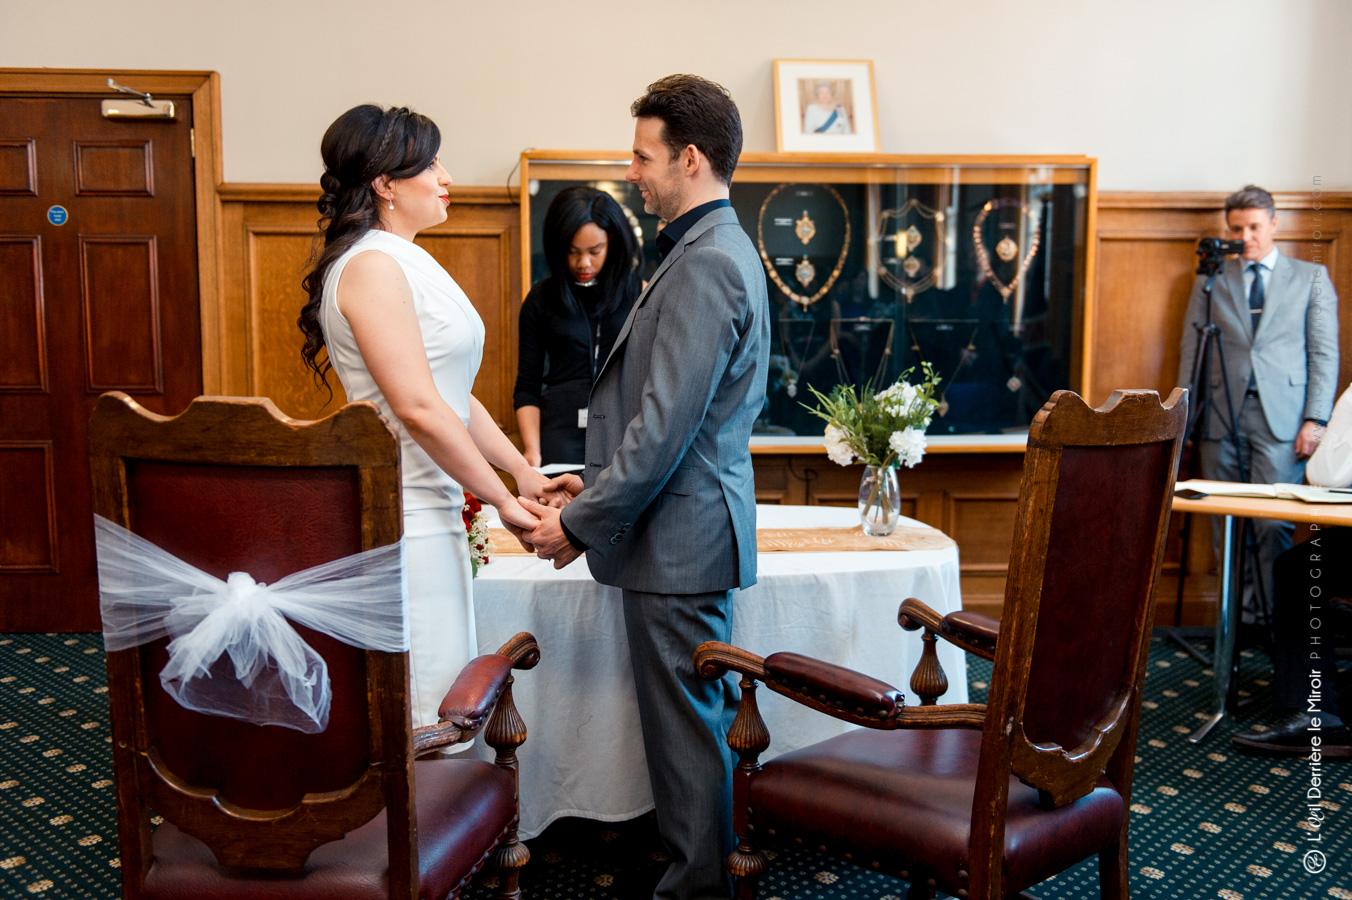 Destination-wedding-photographer-london-AG-015